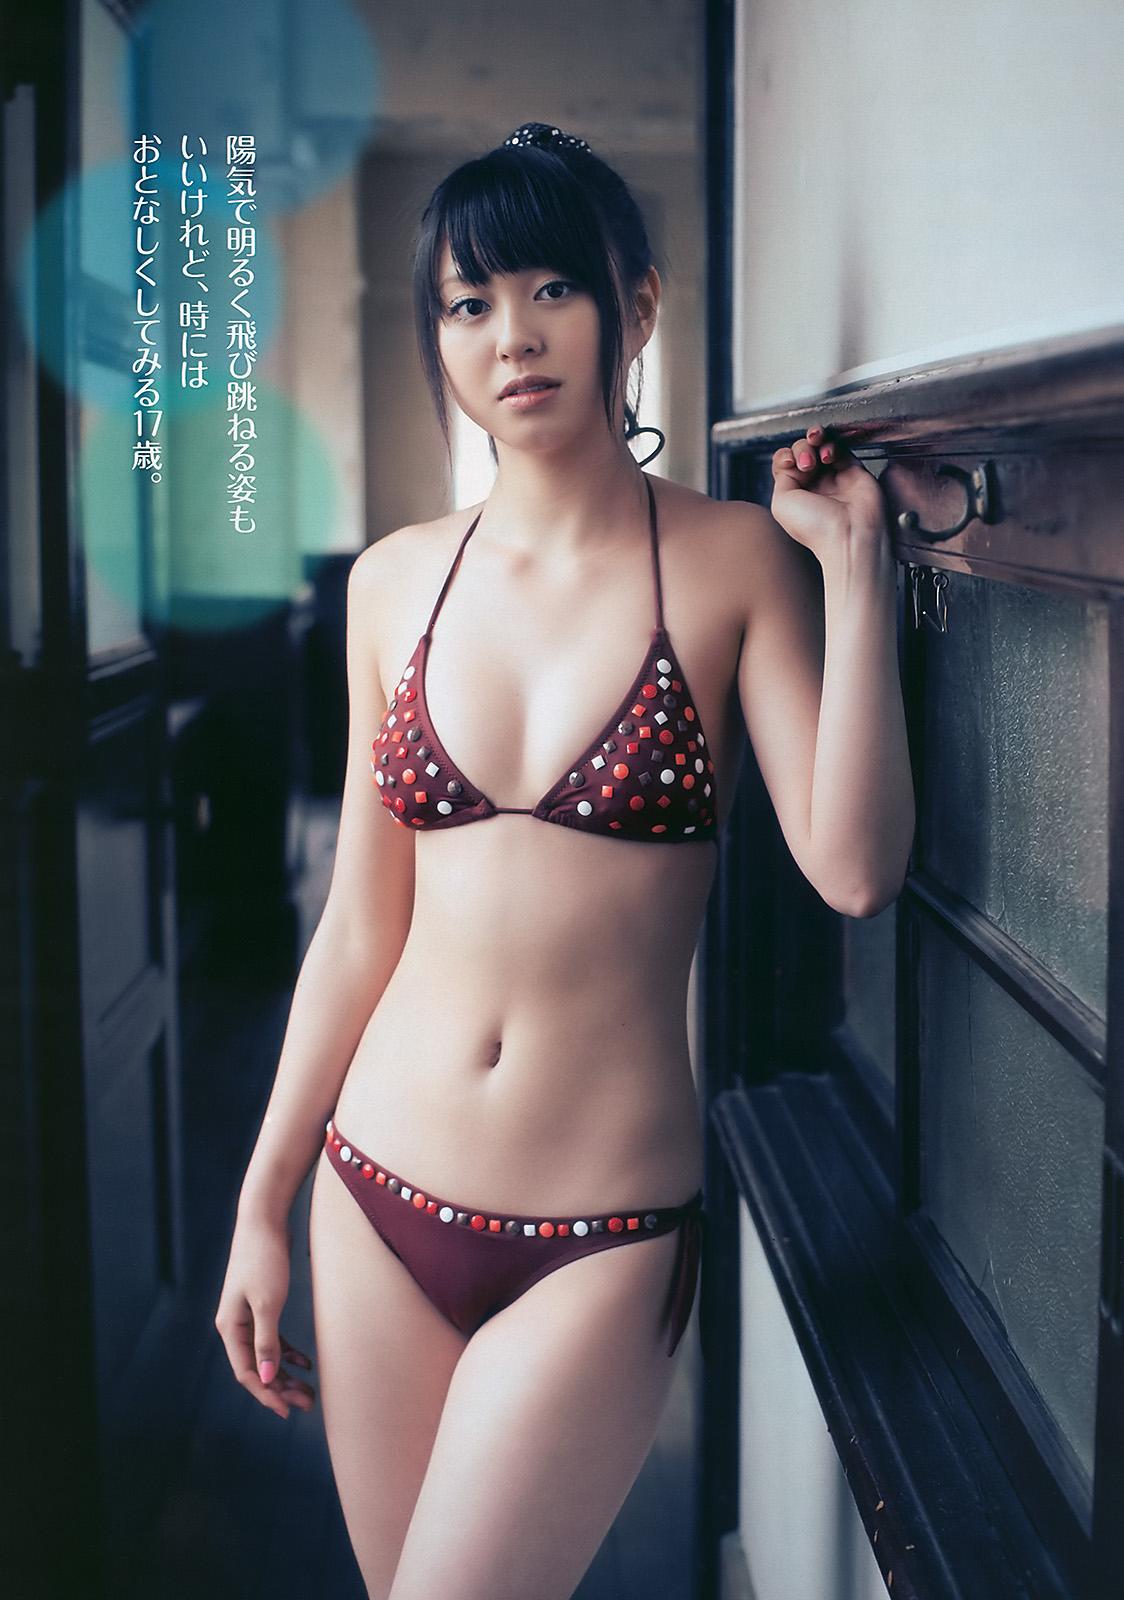 Gravure: Yui Koike (小池 唯)